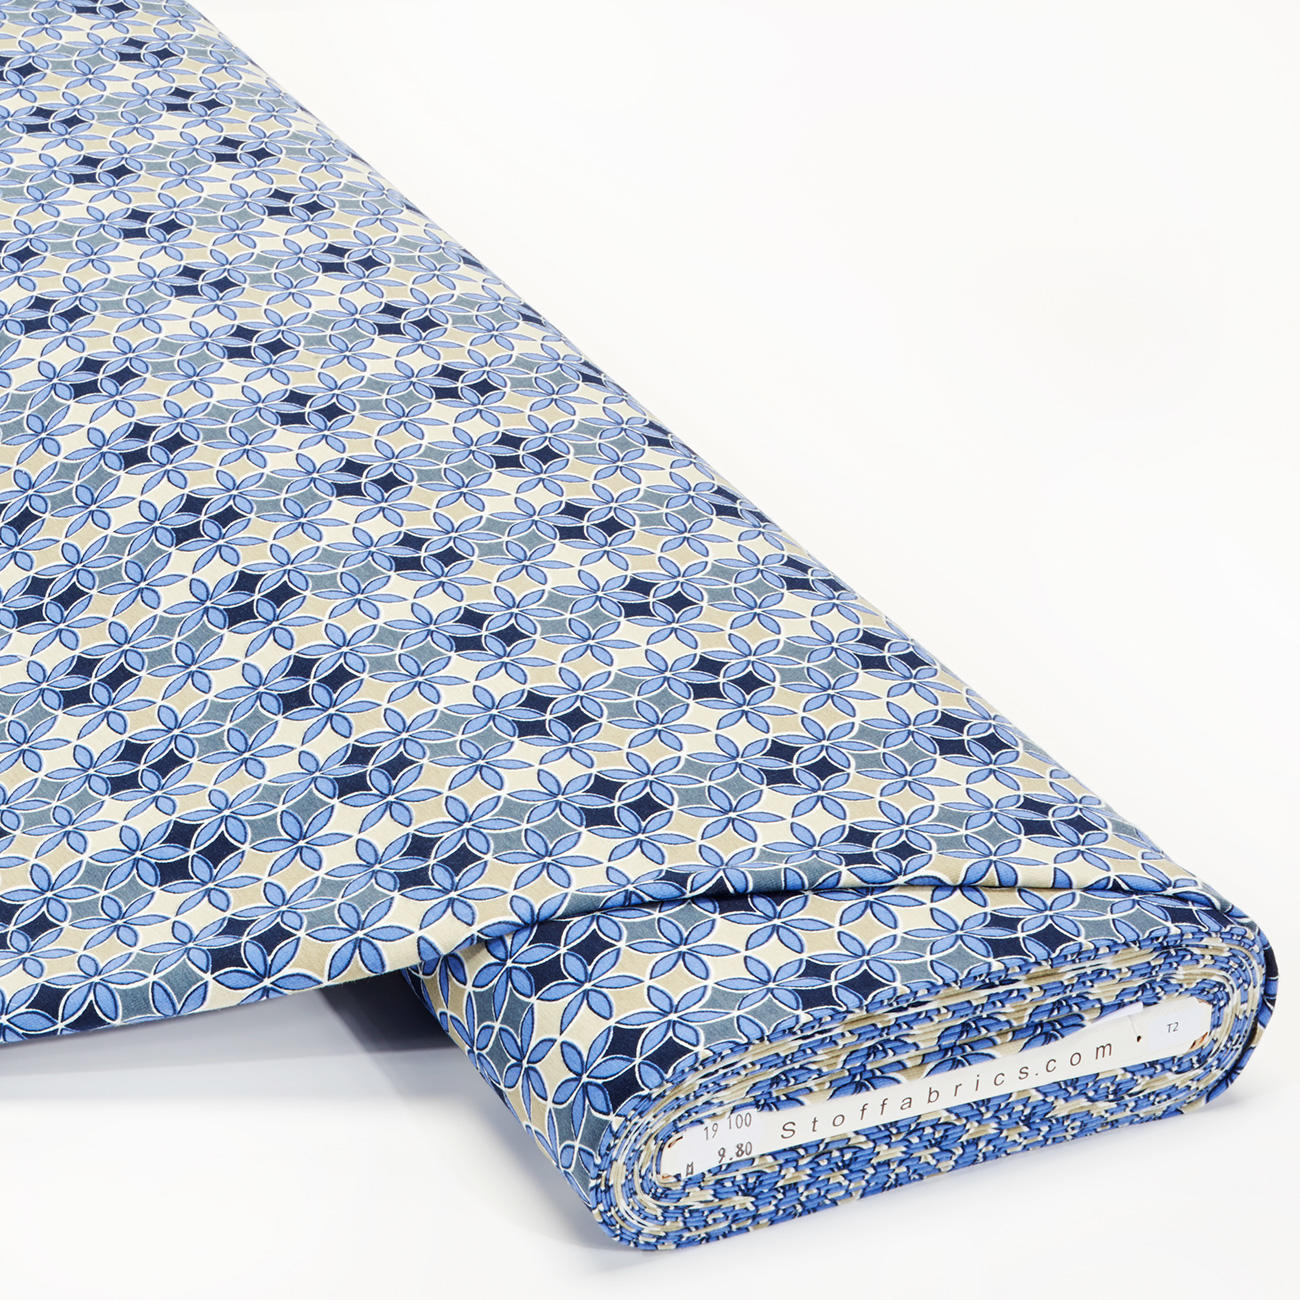 Meterware - Baumwoll-Jersey, Blumen Blau